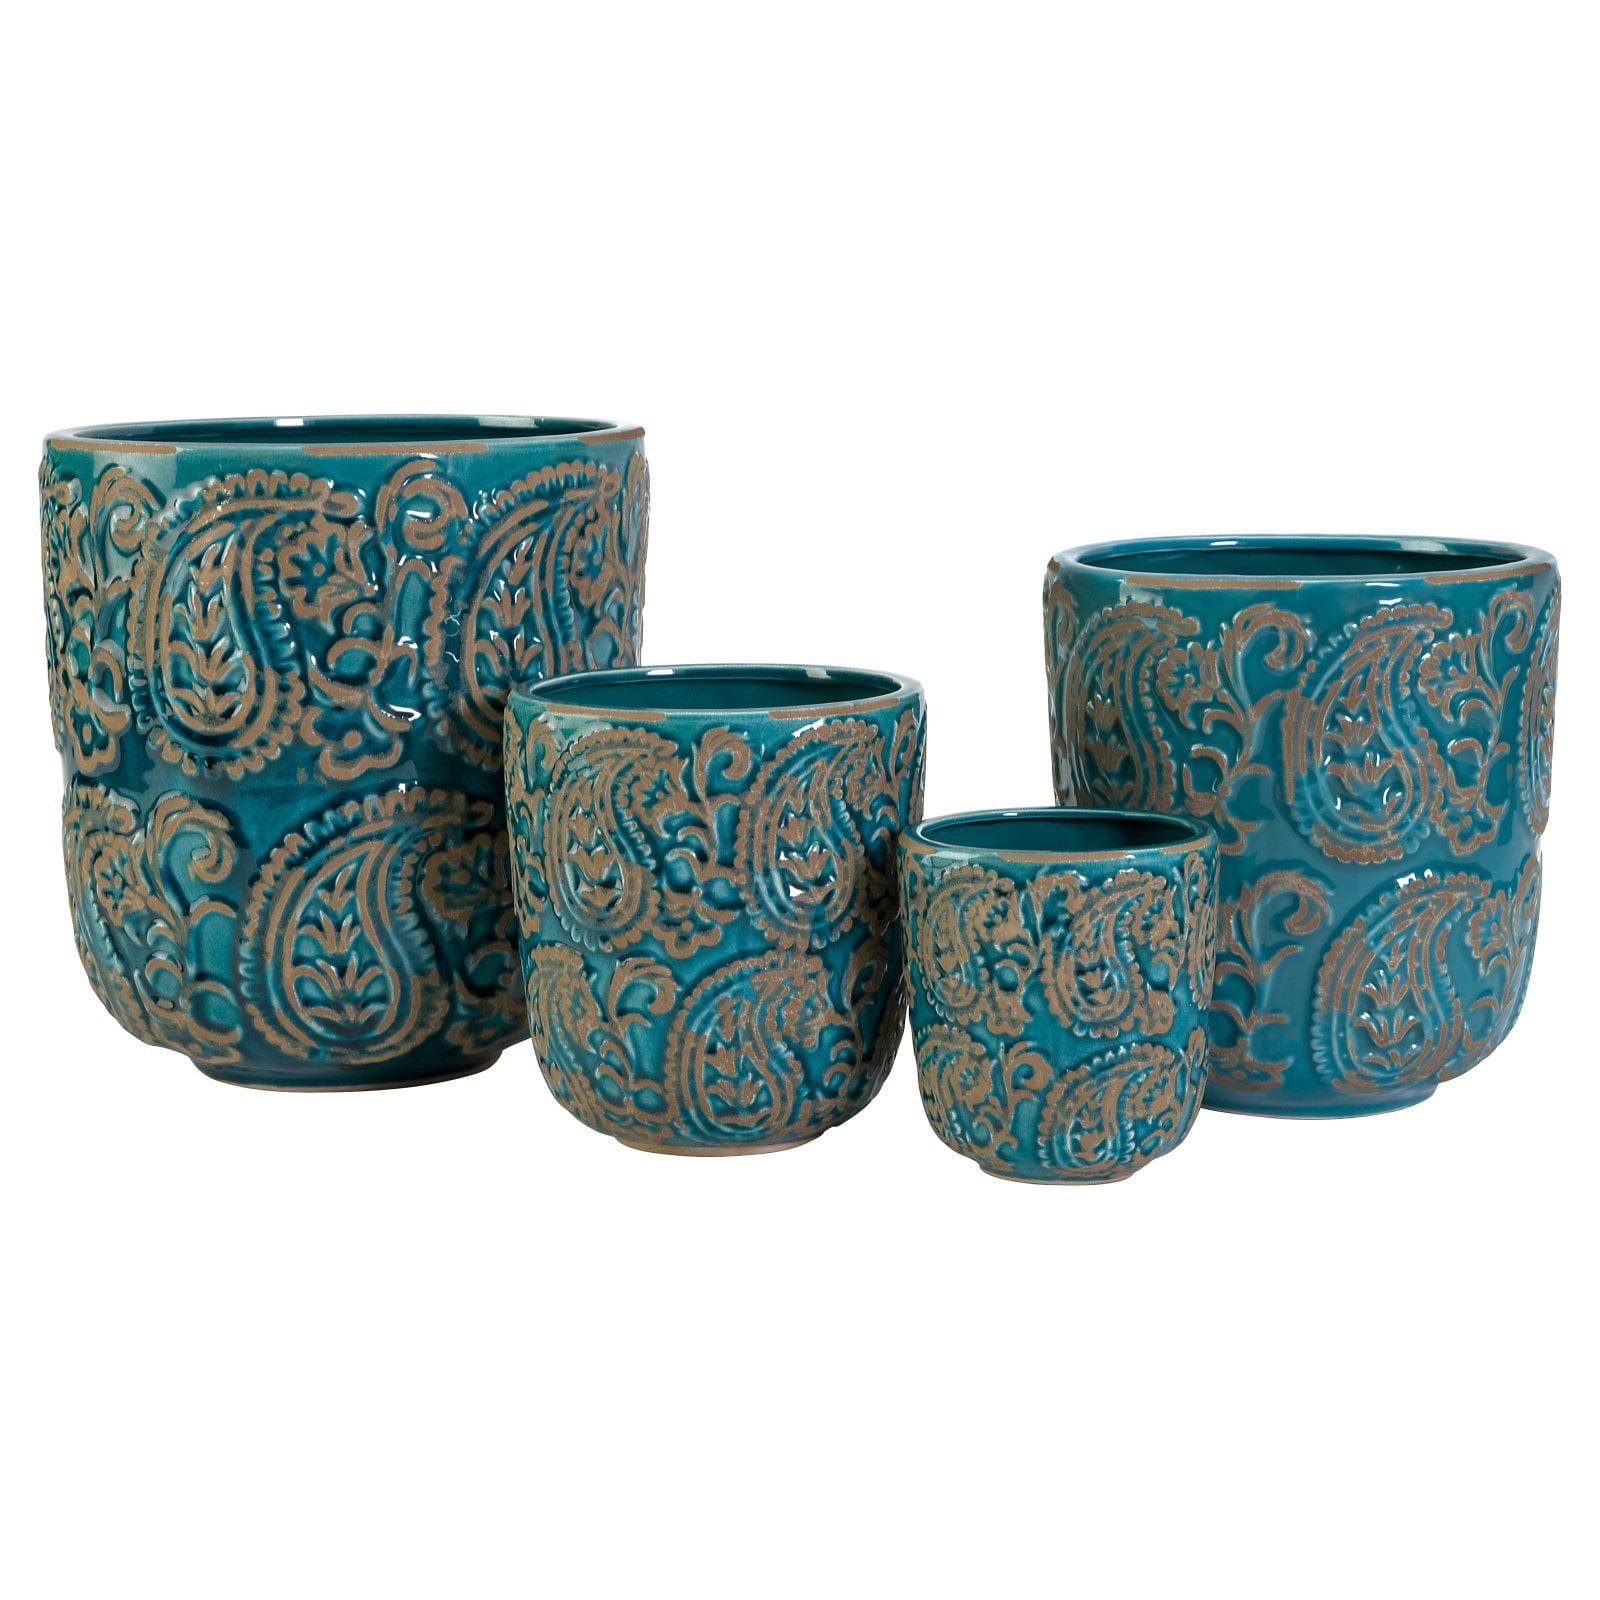 Paisley Blue Planters - Set of 4